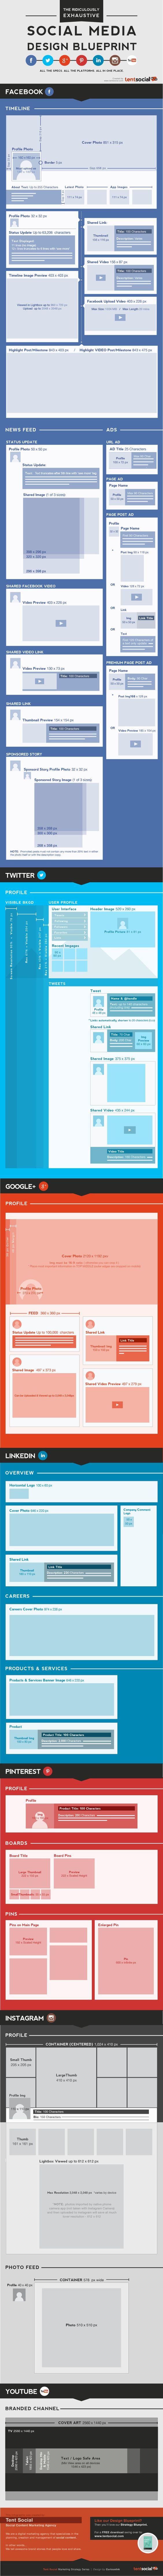 The Ridiculously Exhaustive Social Media Design Blueprint  #Infographic #SocialMedia #CheatSheet